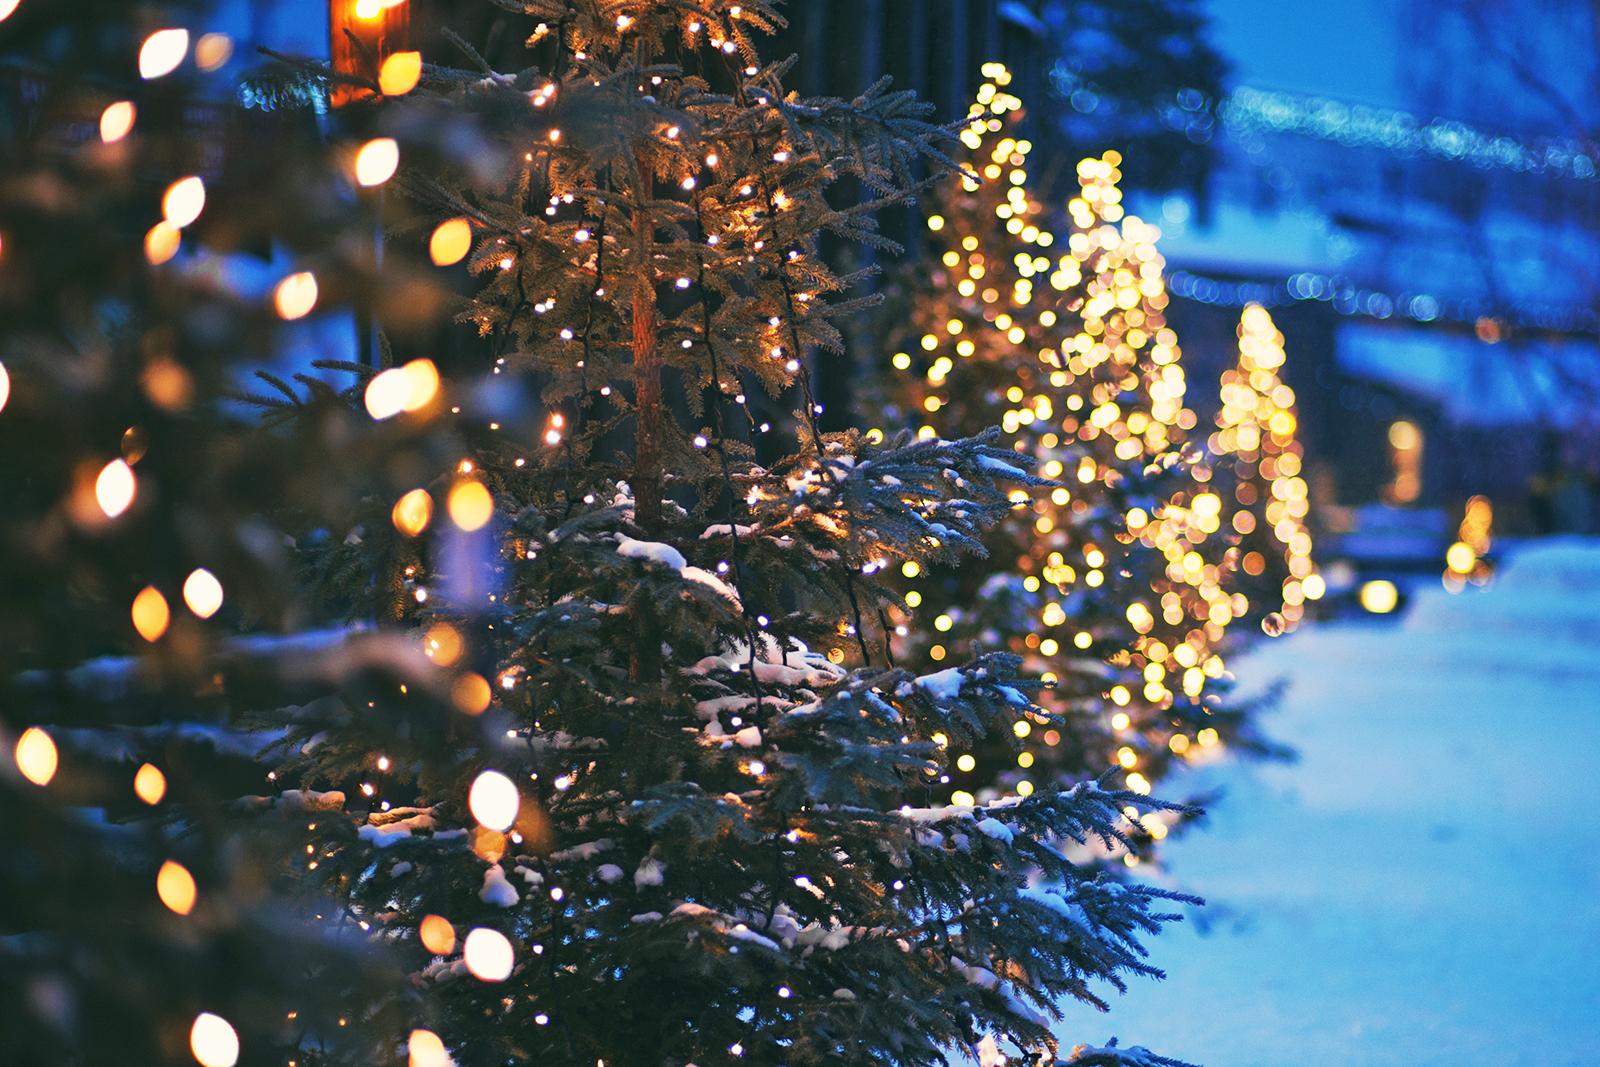 Christmas trees. Photo: Shutterstock